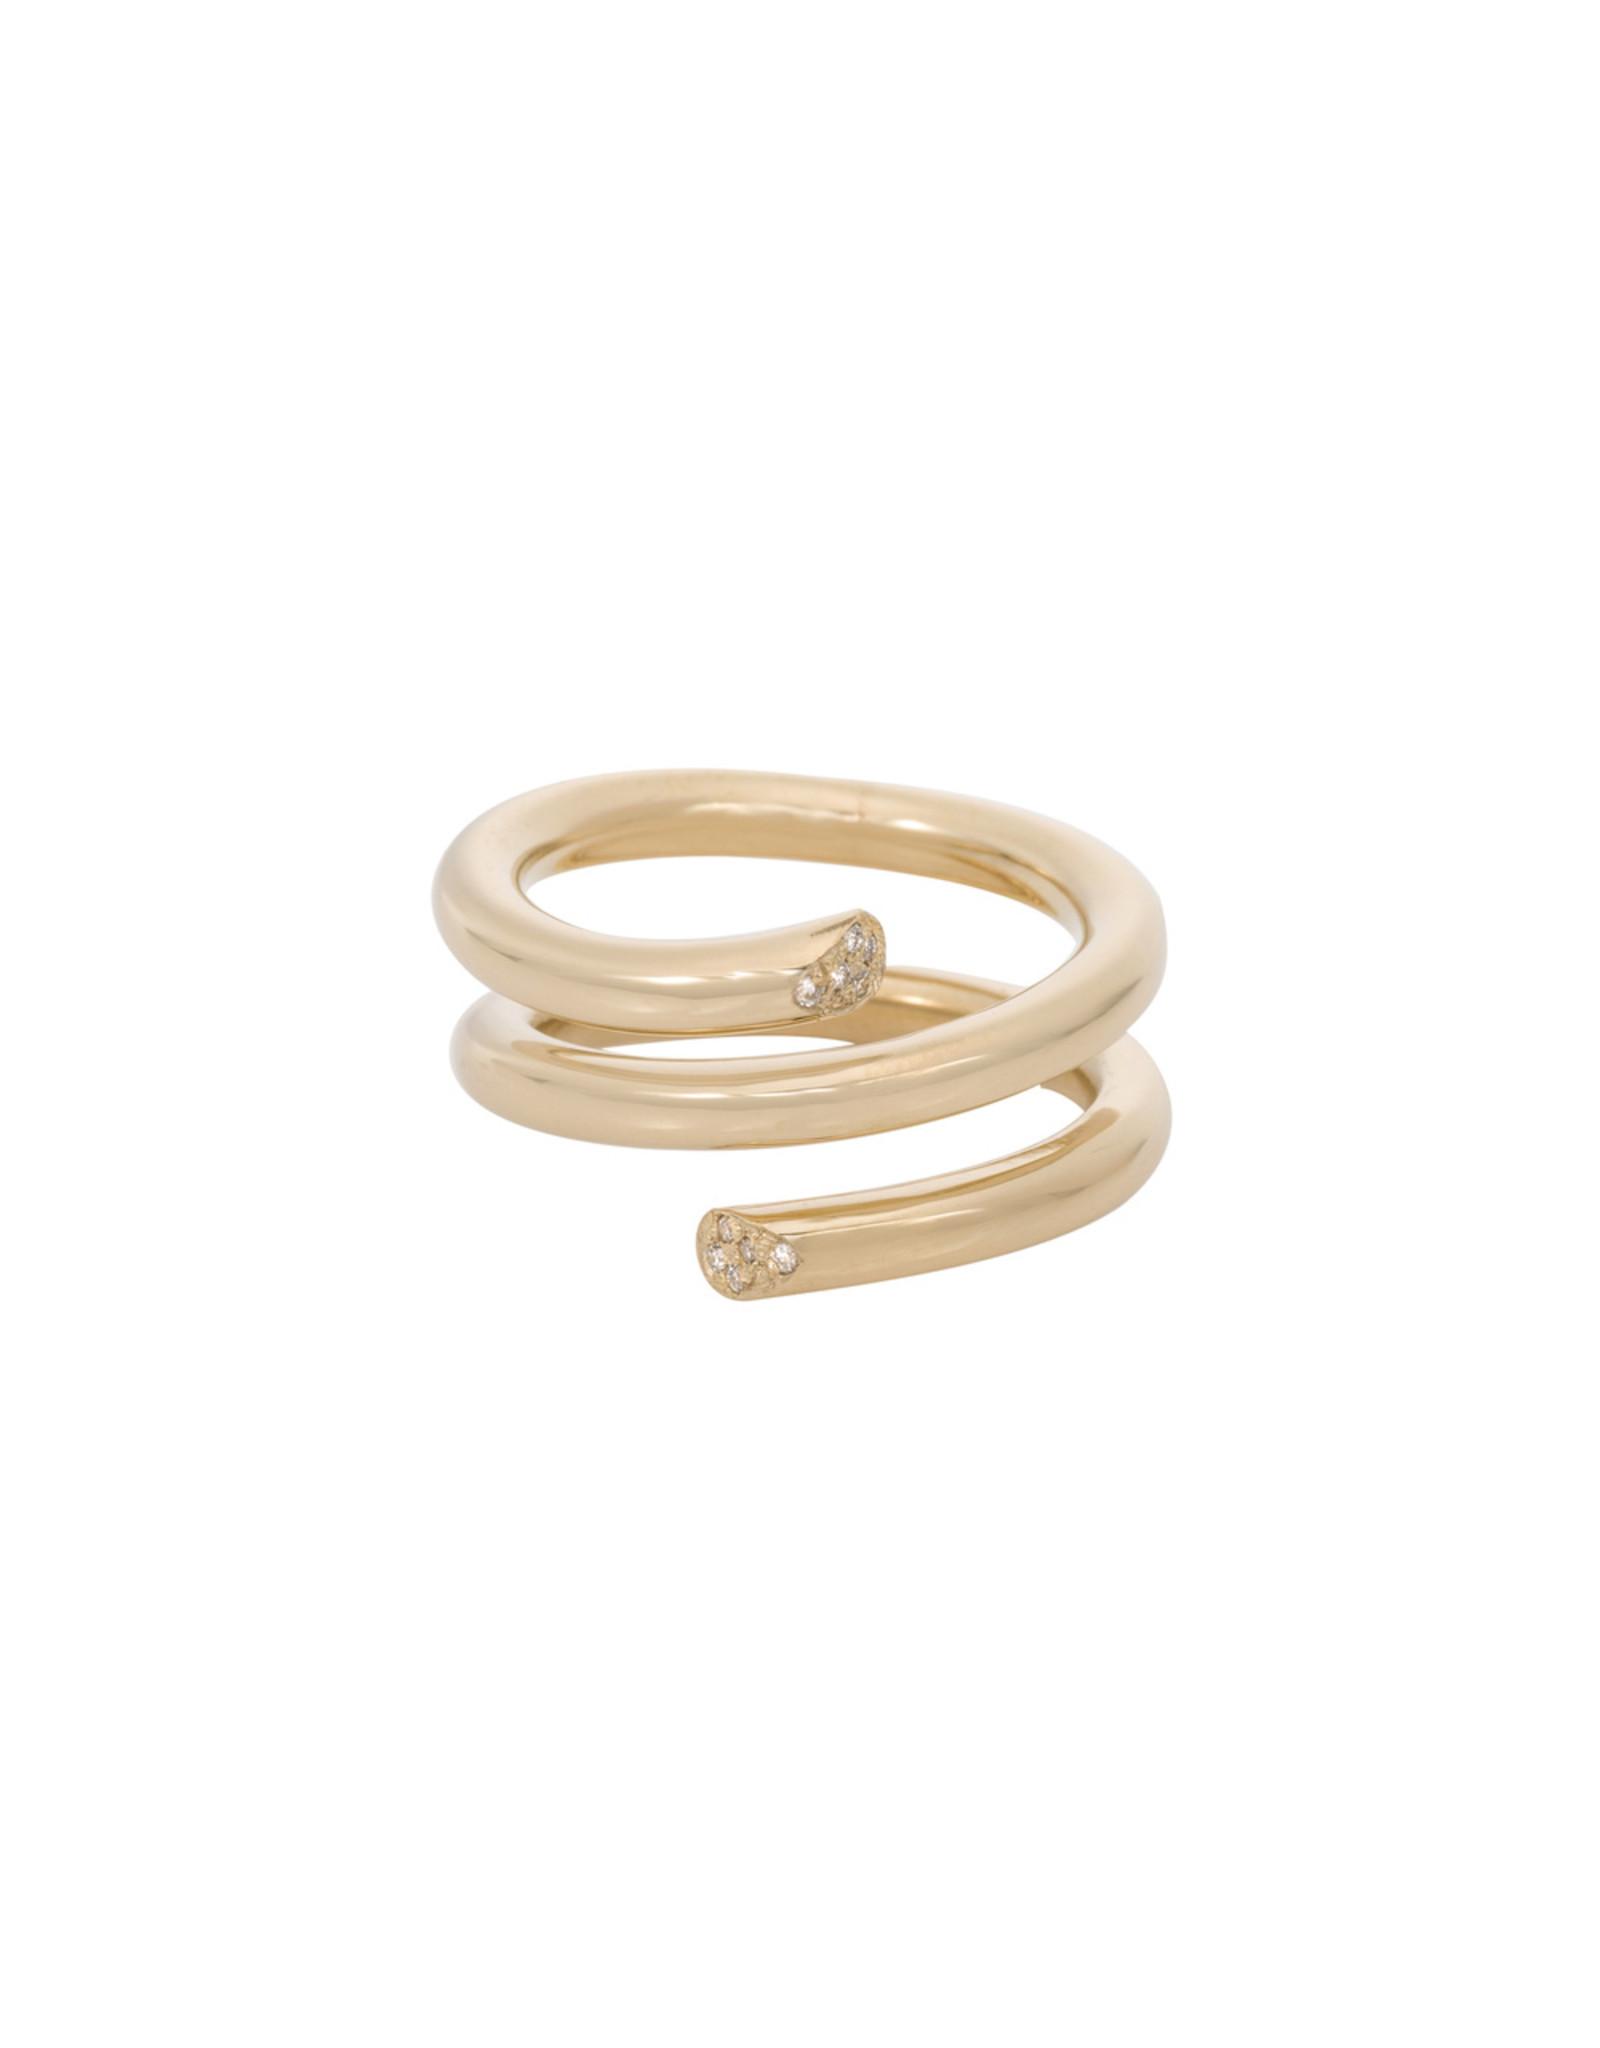 Ariel Gordon Ariel Gordon Pavé Spring Ring (Color: Yellow Gold, Size: 6)